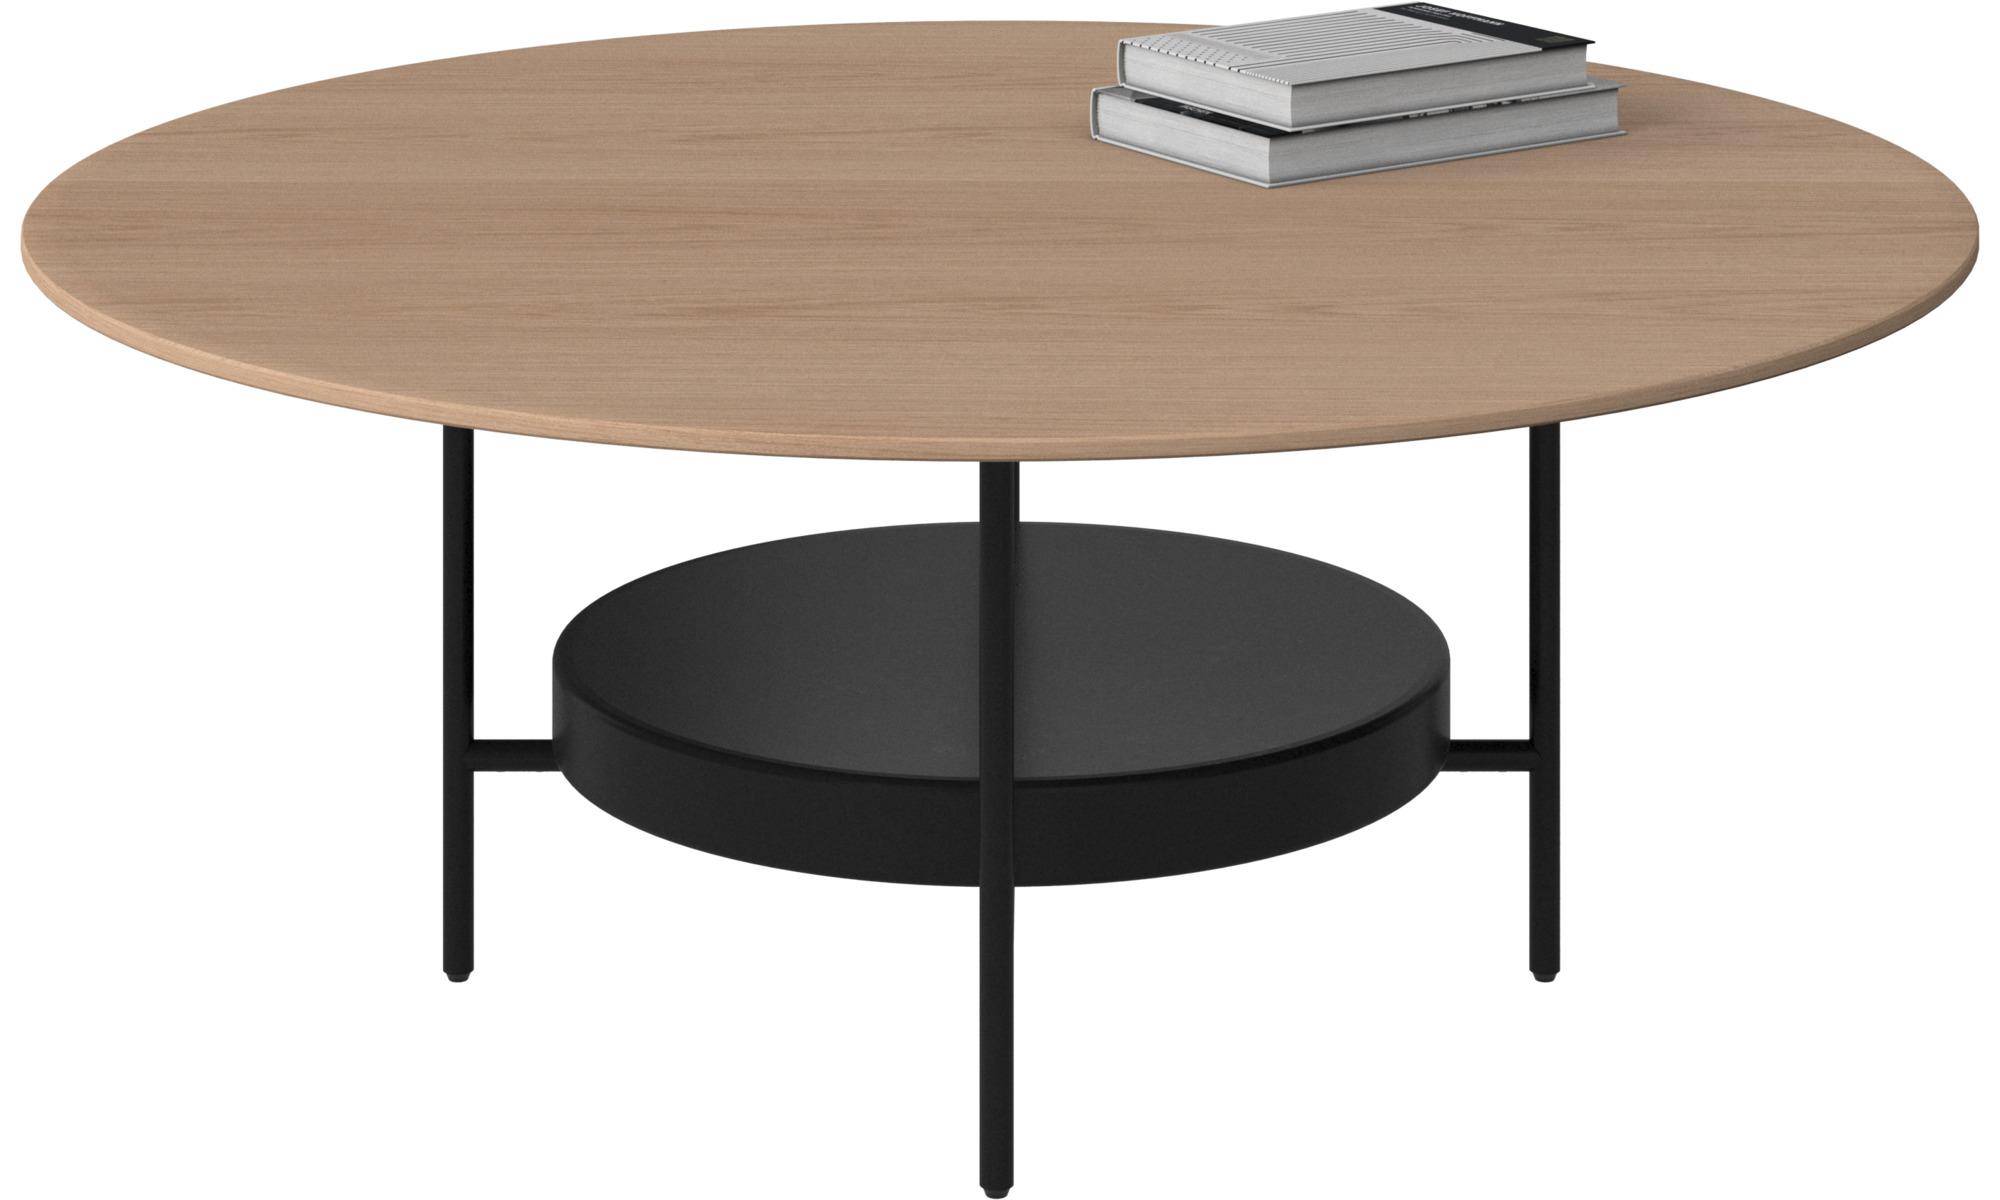 Tables basses - Table basse Madrid - rotonde - Marron - Chêne